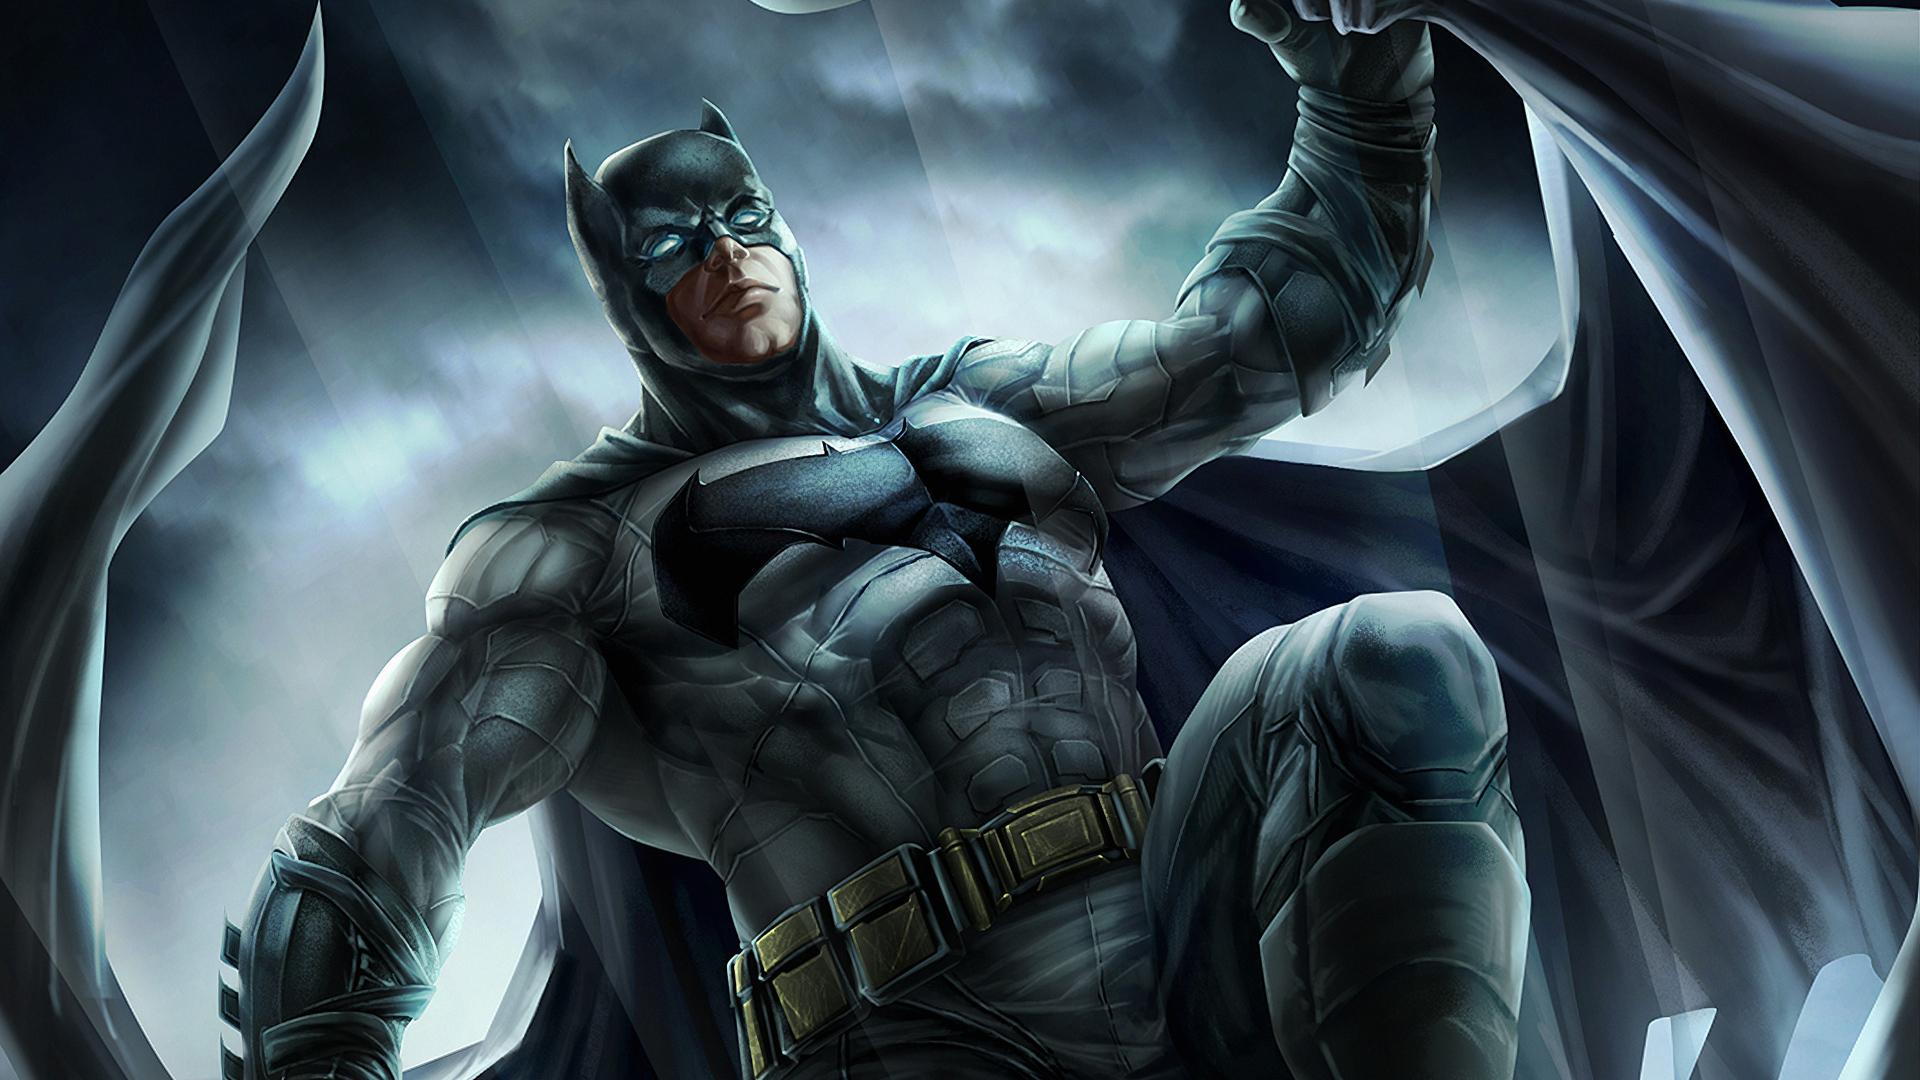 1920x1080 Hd Batman Laptop Full HD 1080P HD 4k Wallpapers ...